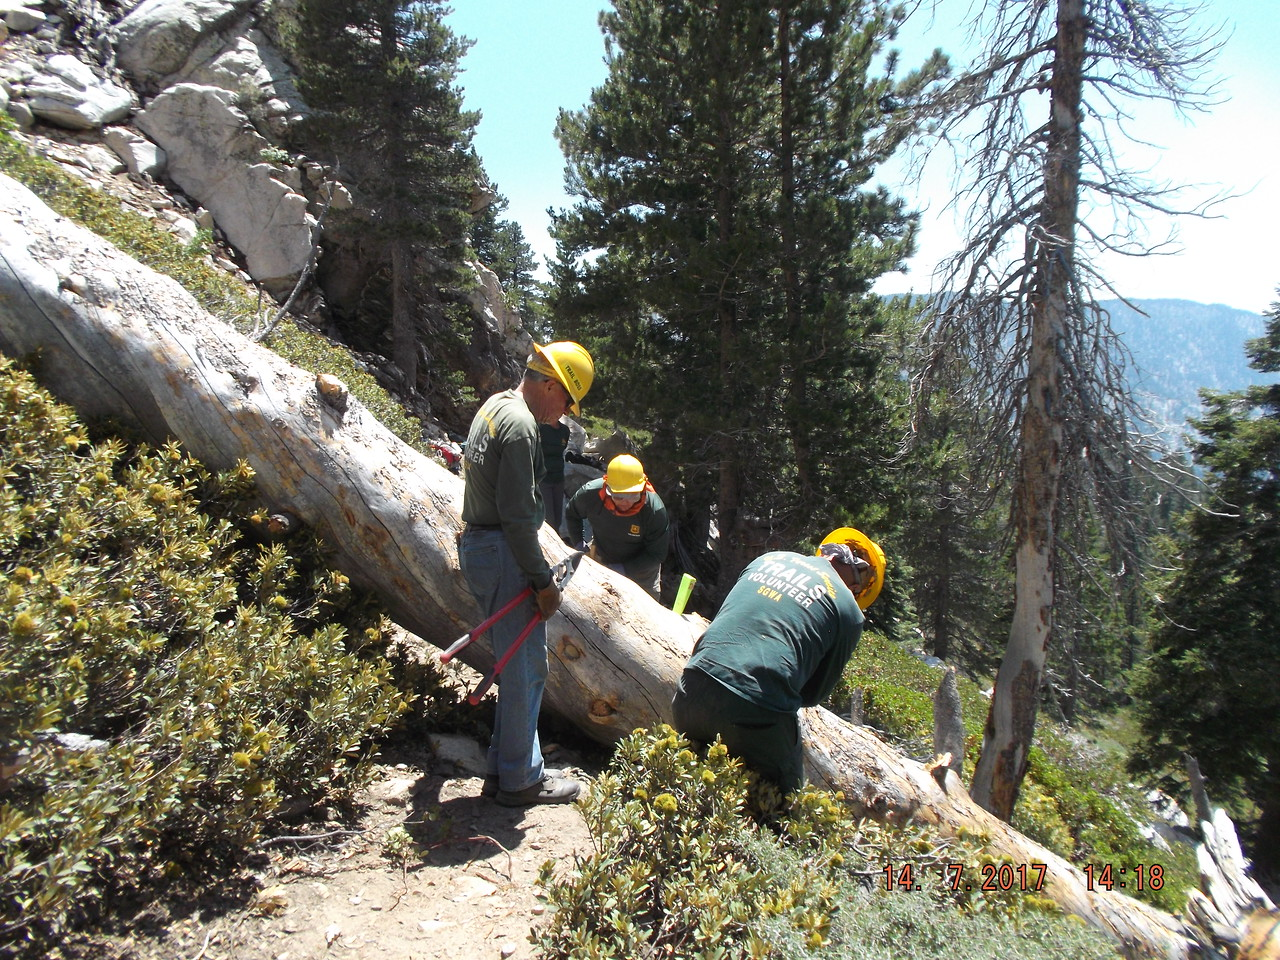 Second Large Tree, Just Below High Creek Camp, San Gorgonio Wilderness